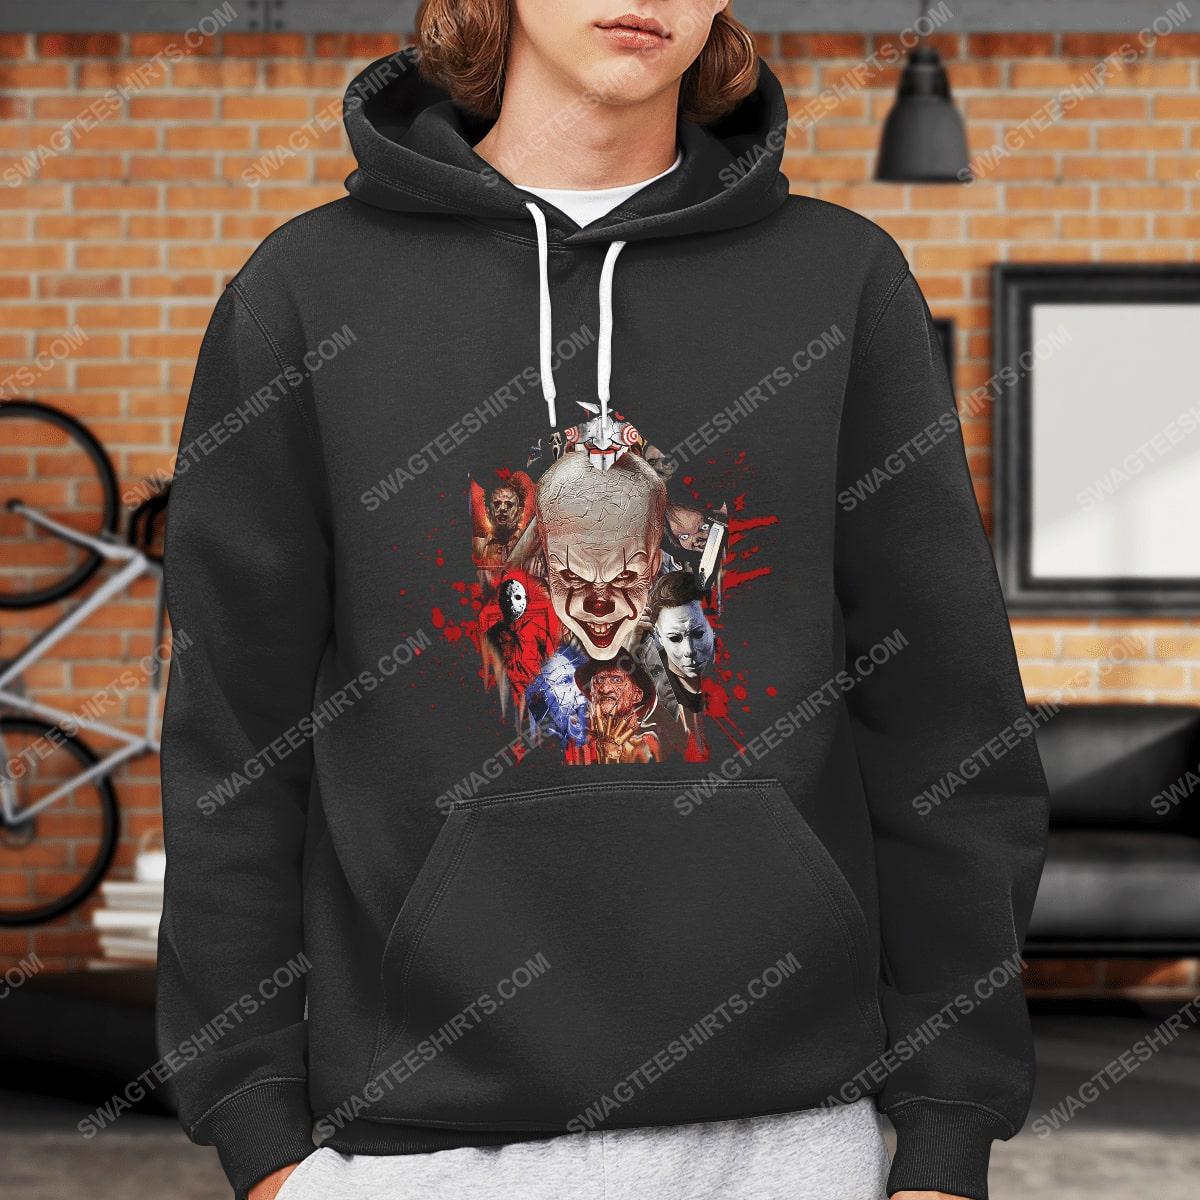 Halloween night horror movie villains with bloody hoodie 1(1)